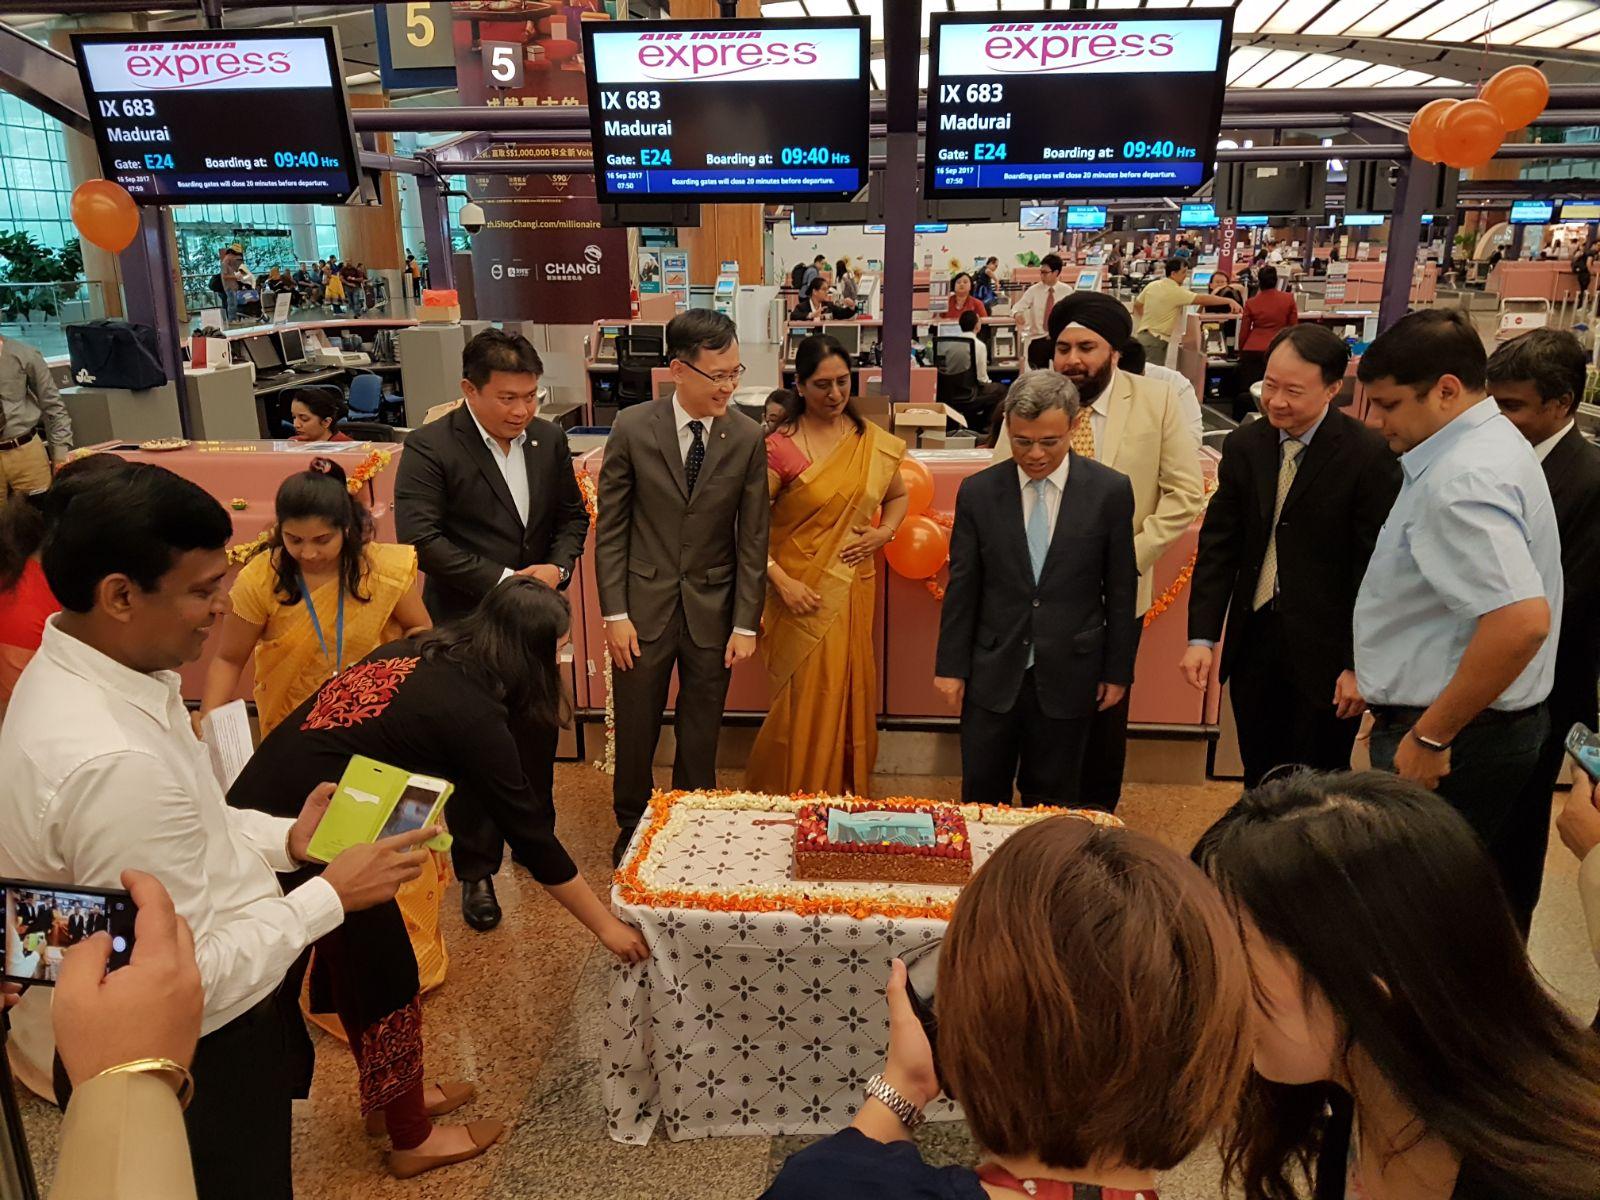 H.E. Jawed Ashraf, High Commissioner of India to Singapore  inaugurating Singapore-Madurai flight of Air India Express at Changi Airport Terminal 2.